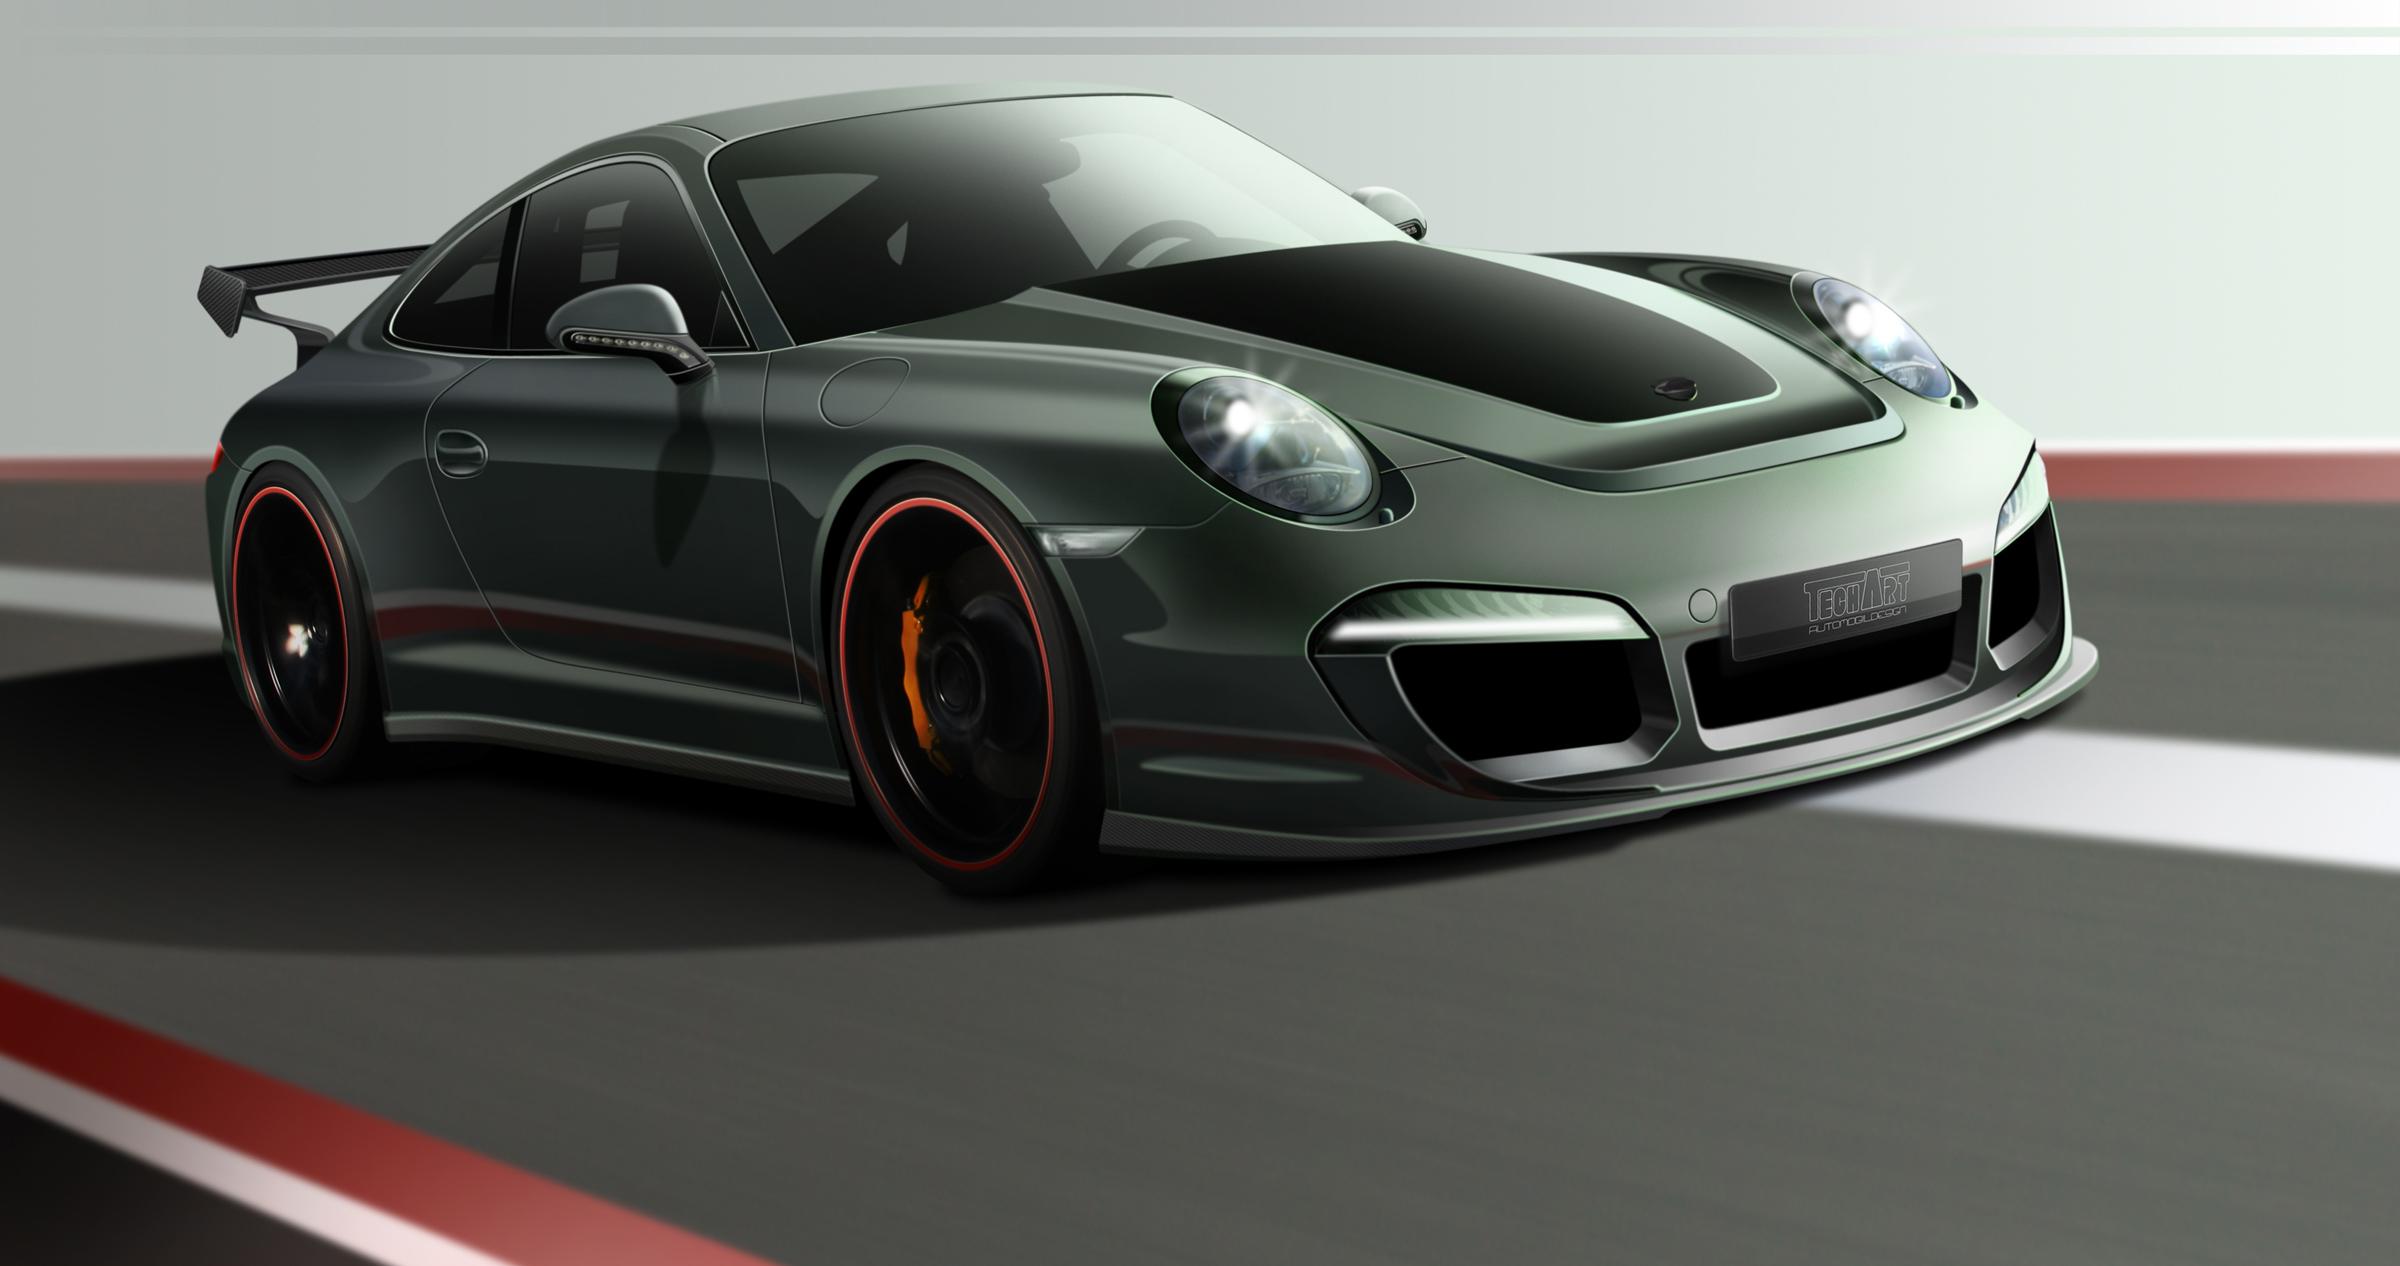 TechArt's Design Concept For The New Porsche 911